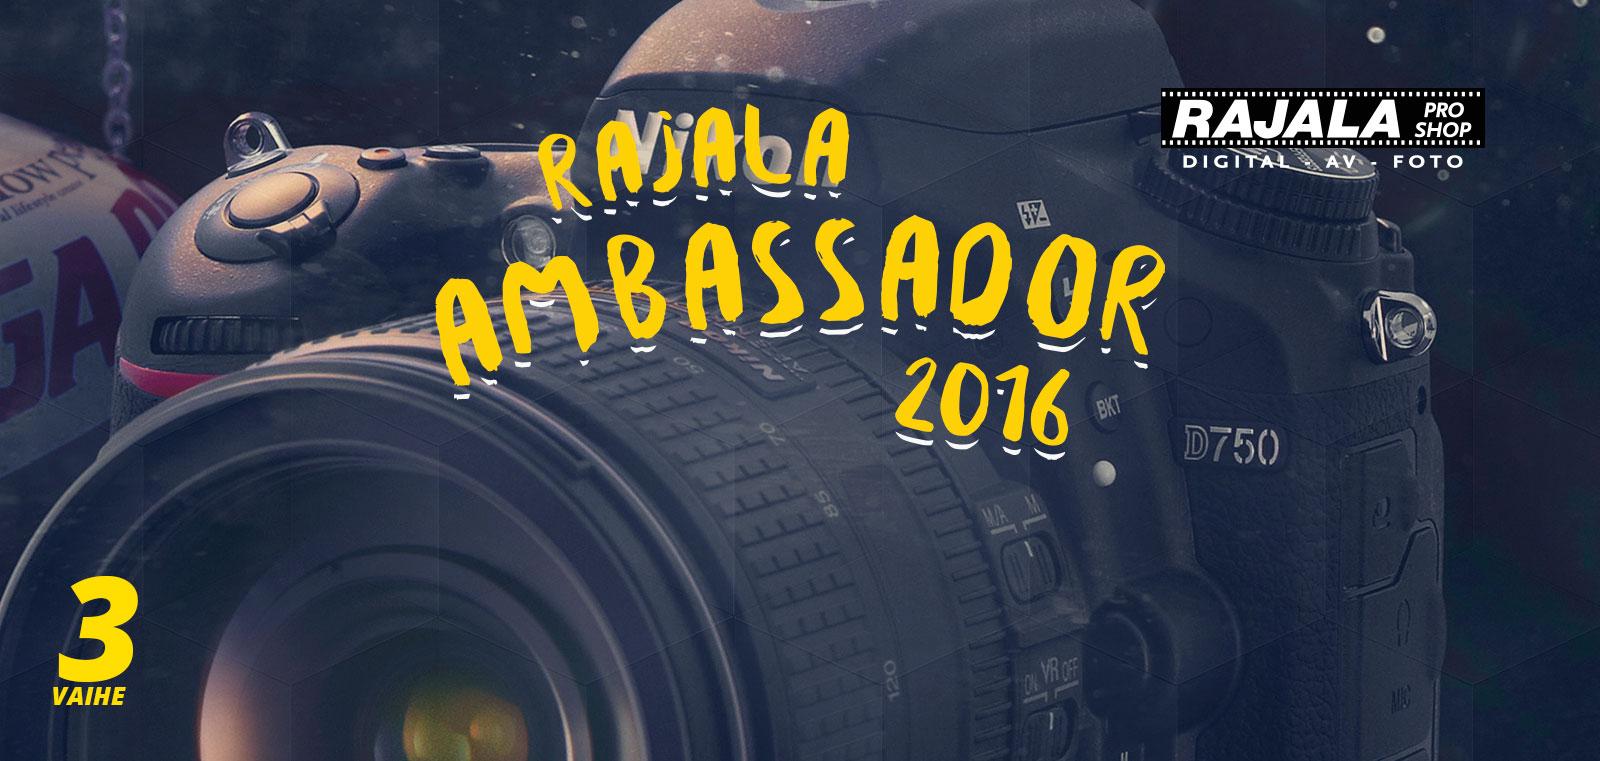 rajala_ambassador_vaihe3_headerkuva